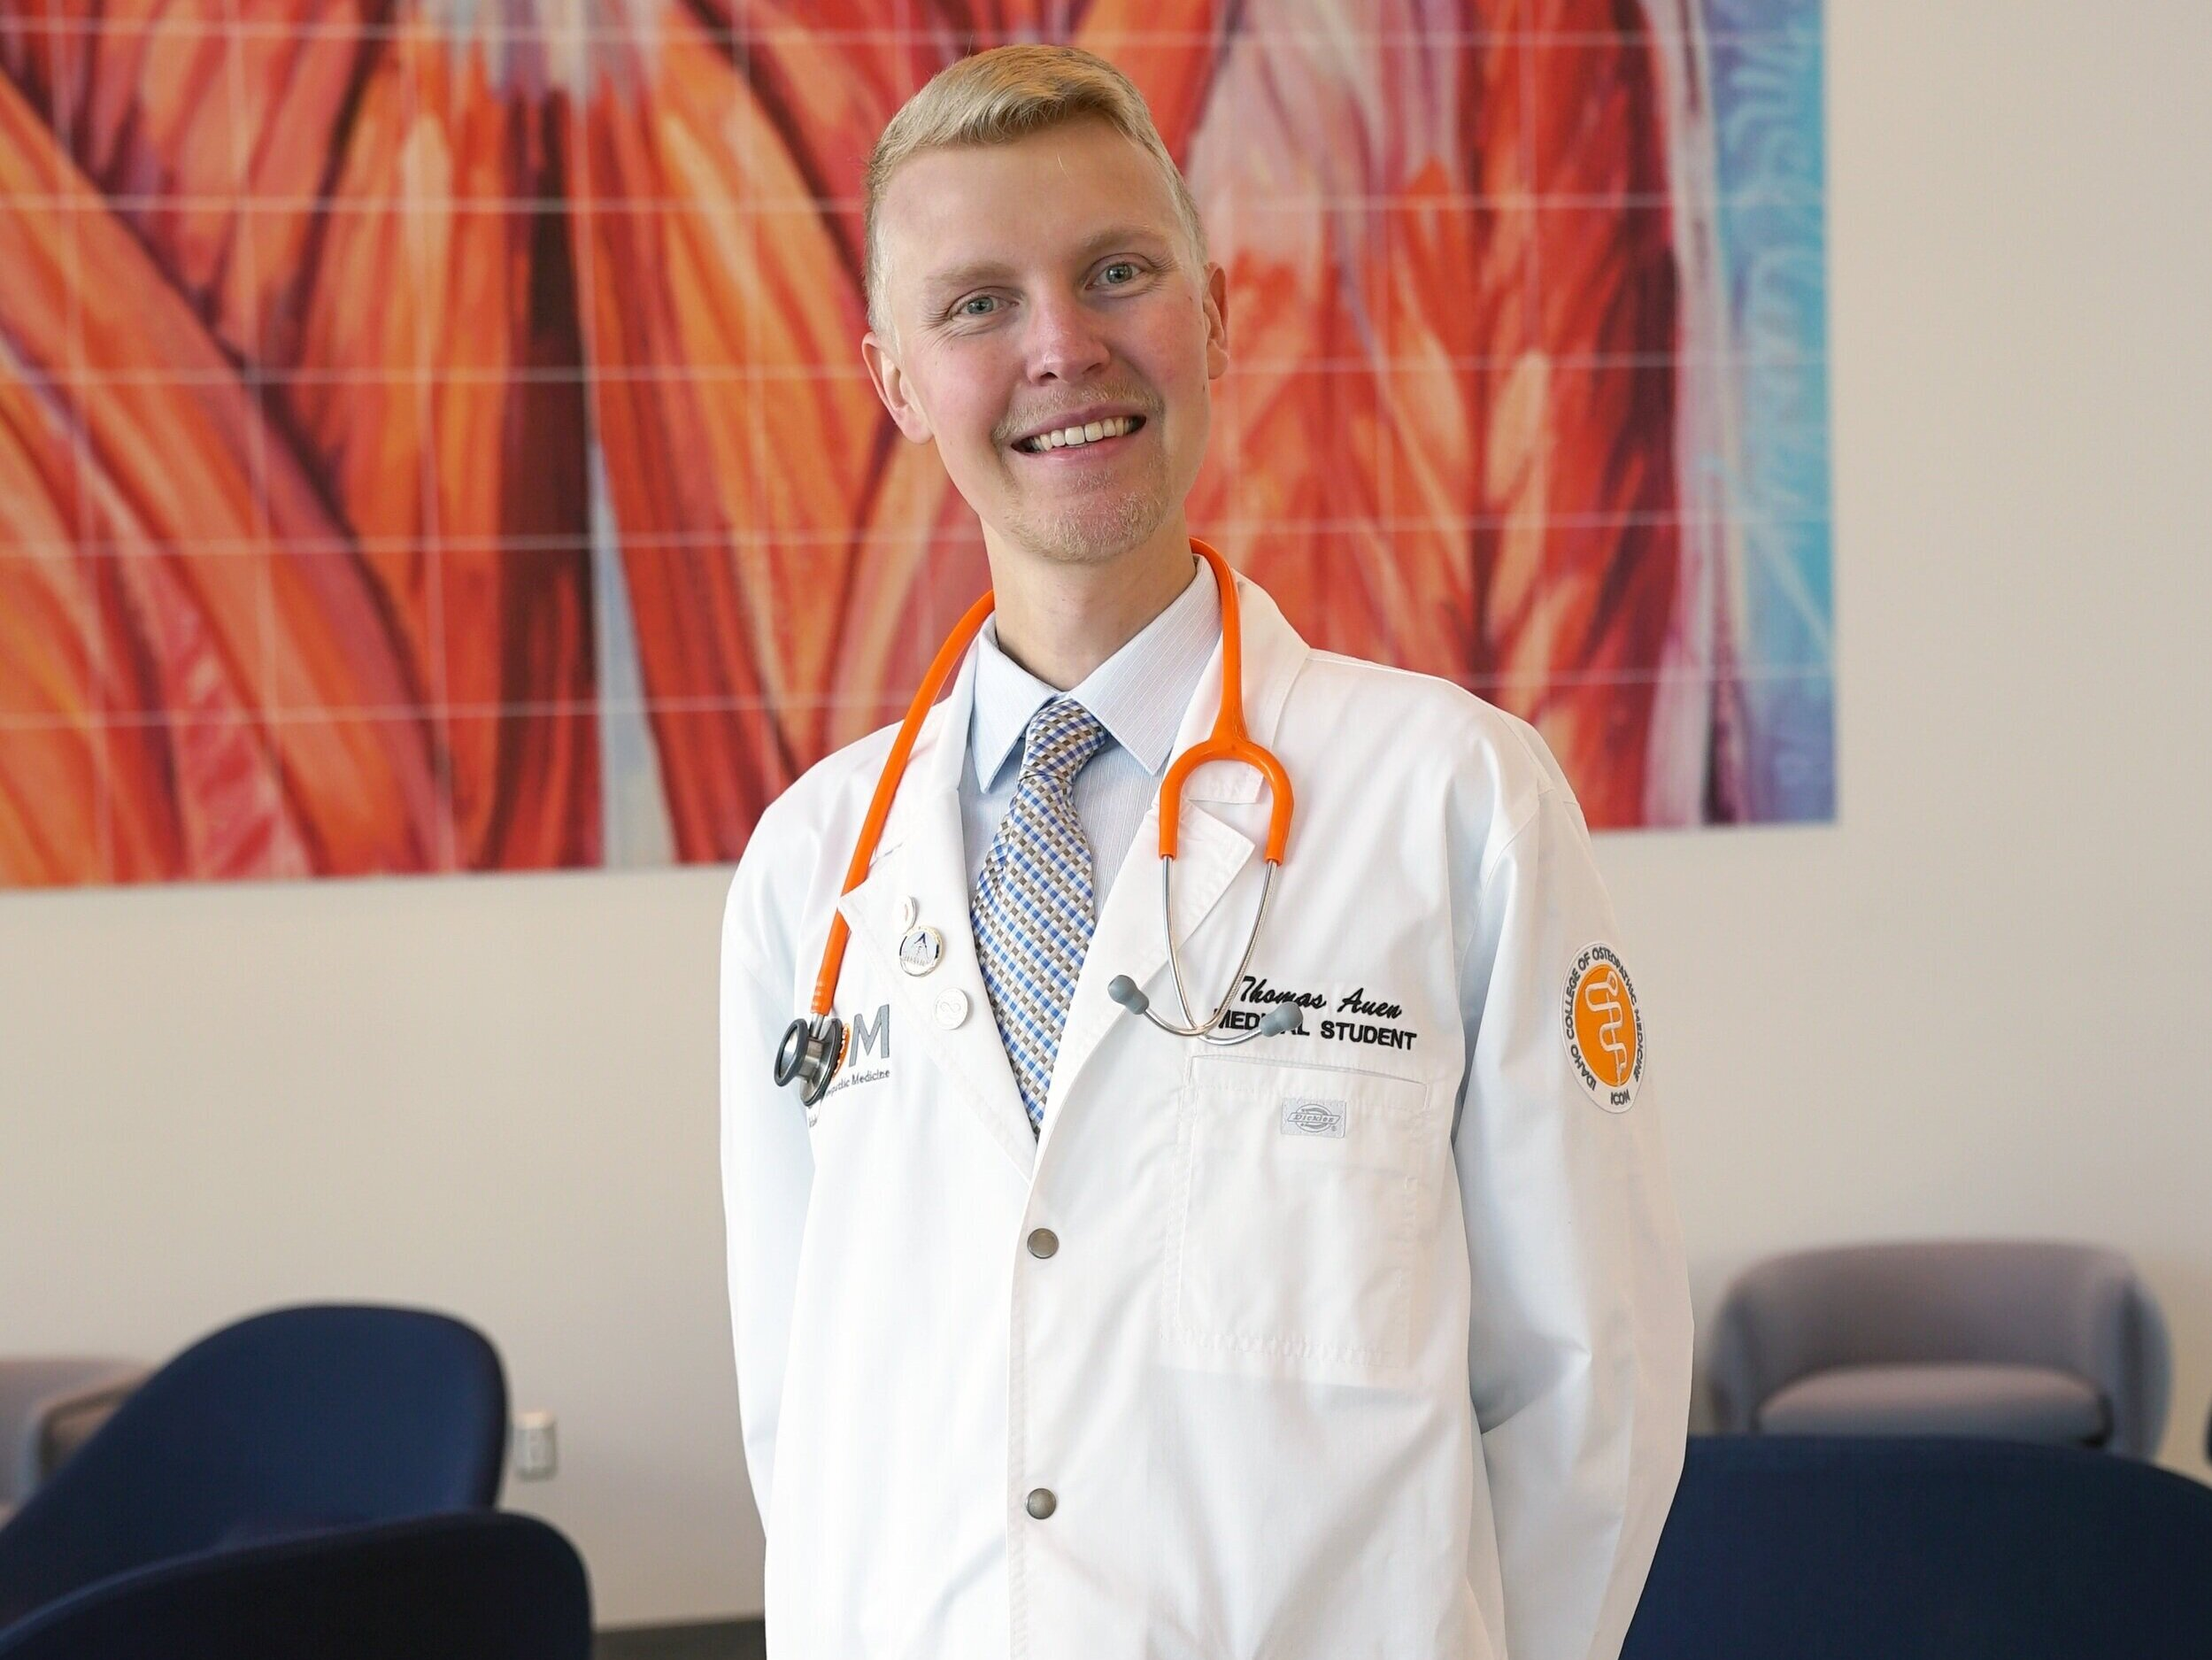 Student-Doctor Thomas Auen